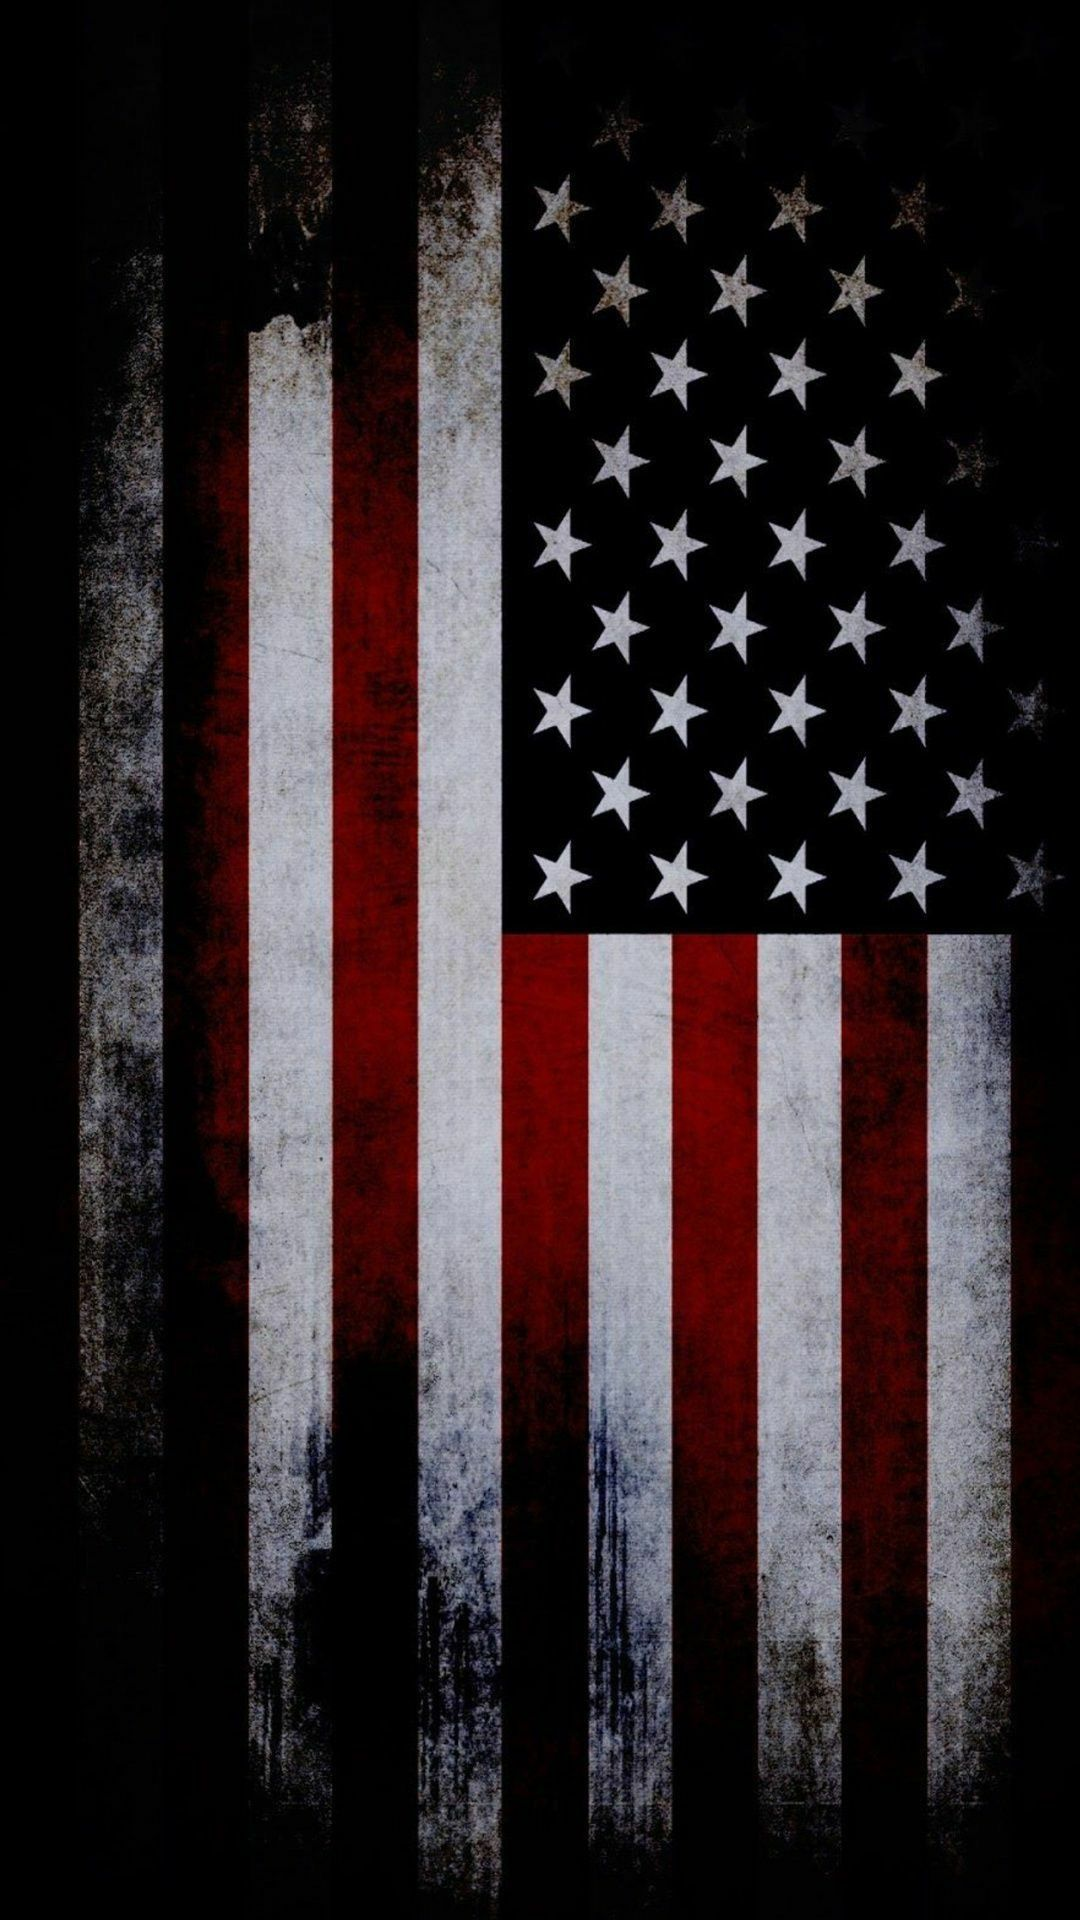 Black American Flag Wallpaper In 2020 American Flag Wallpaper Iphone American Flag Wallpaper America Flag Wallpaper